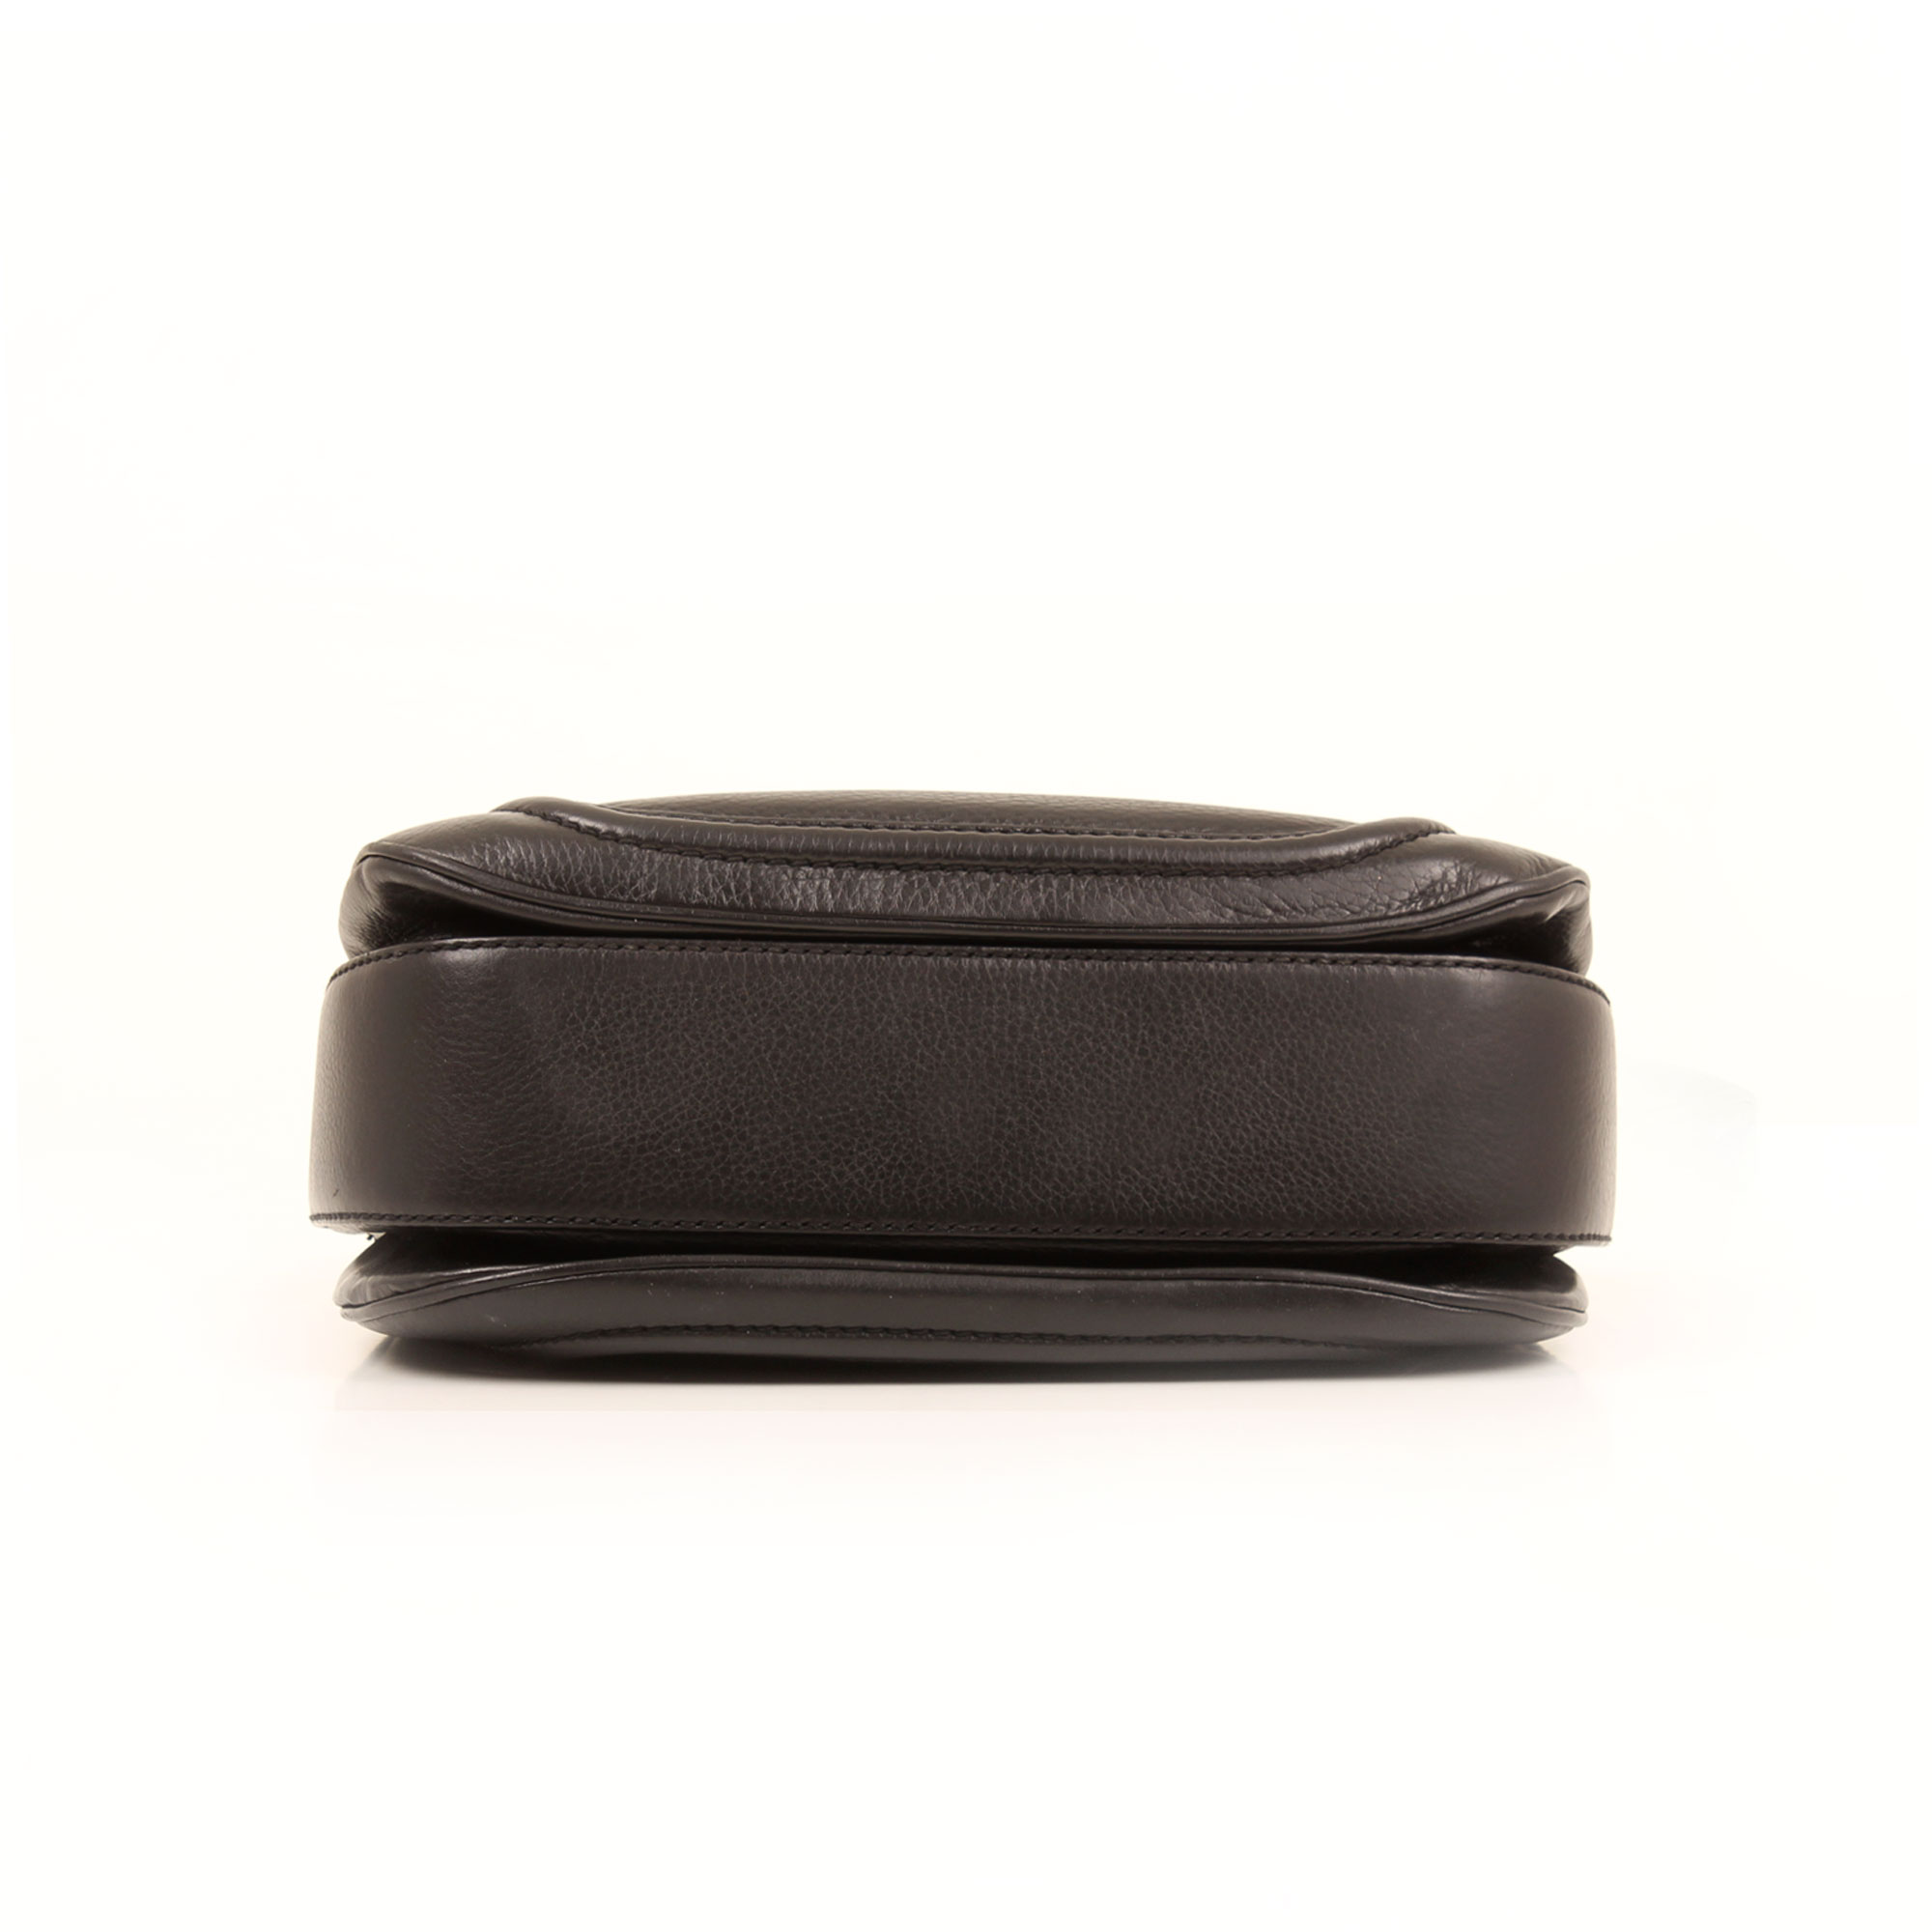 Imagen de la base del bolso gucci new bamboo negro